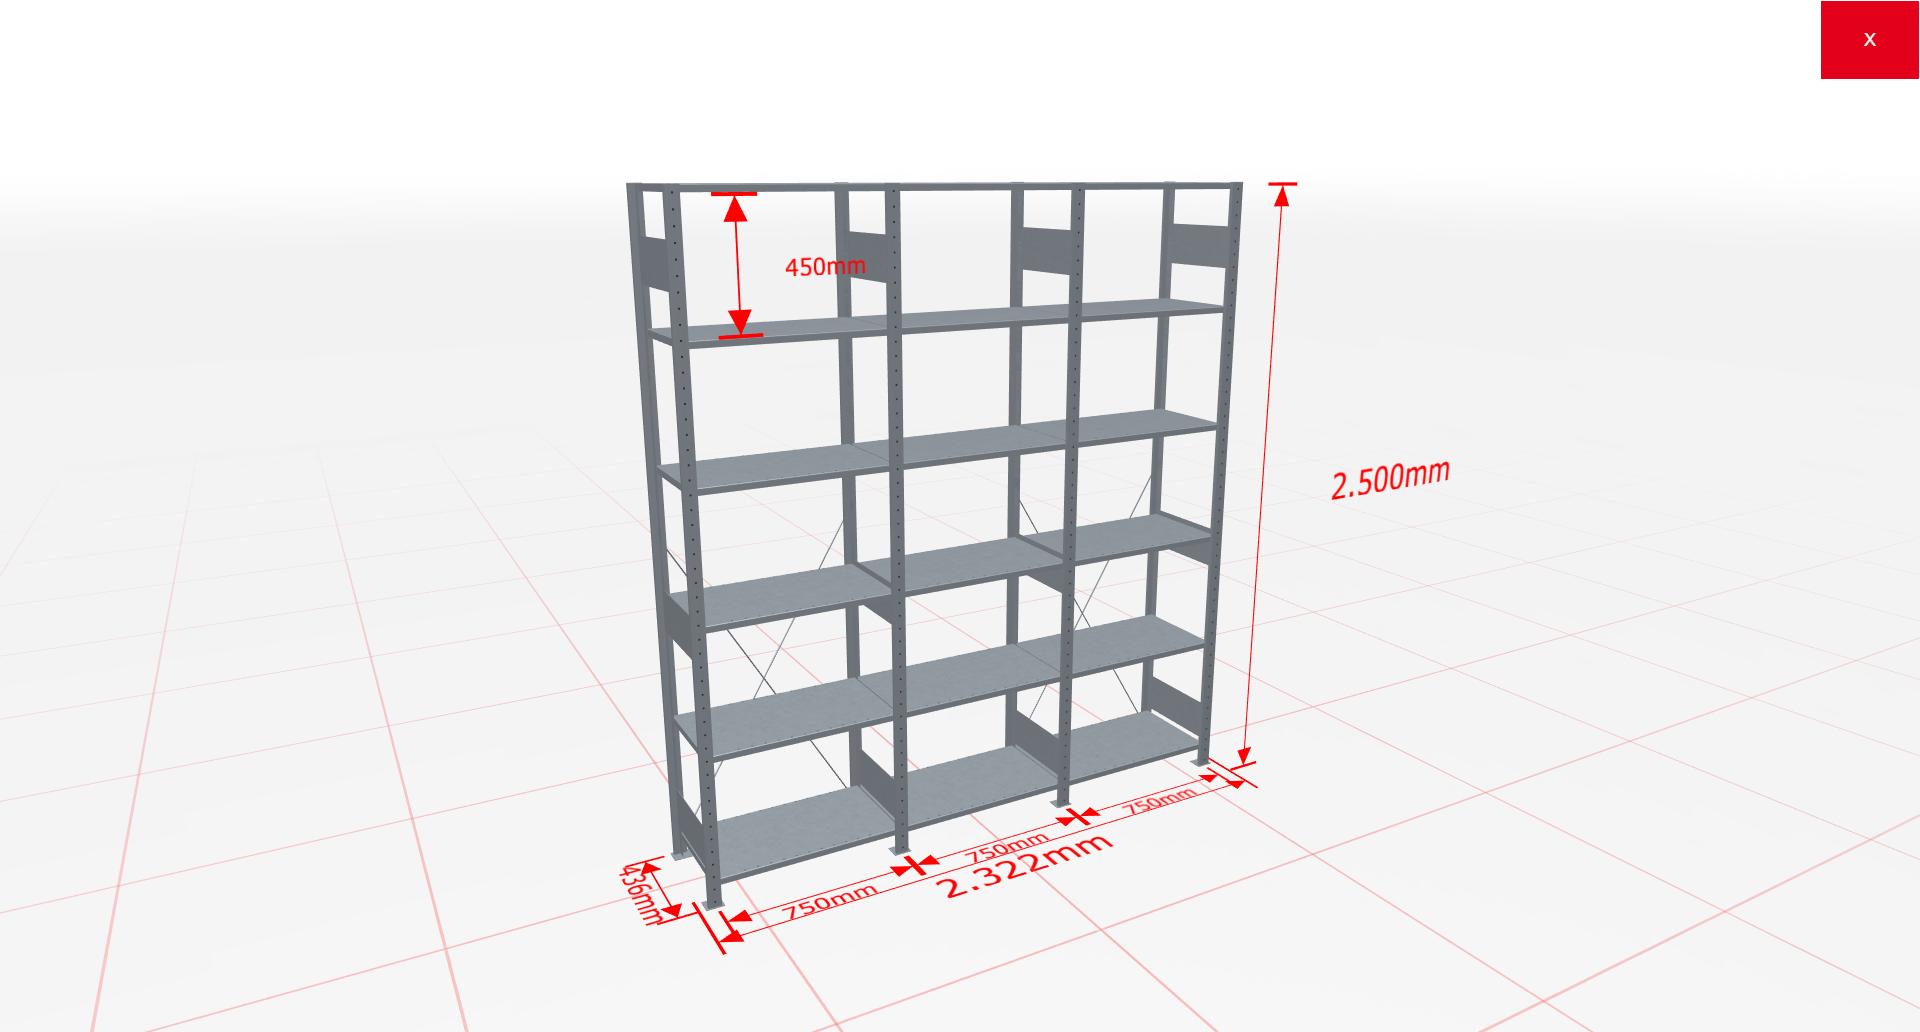 Fachbodenregal Komplettregal 2500x2322x400 mm (HxBxT) SCHULTE Lagertechnik verzinkt 6 Ebenen  150 kg je Boden